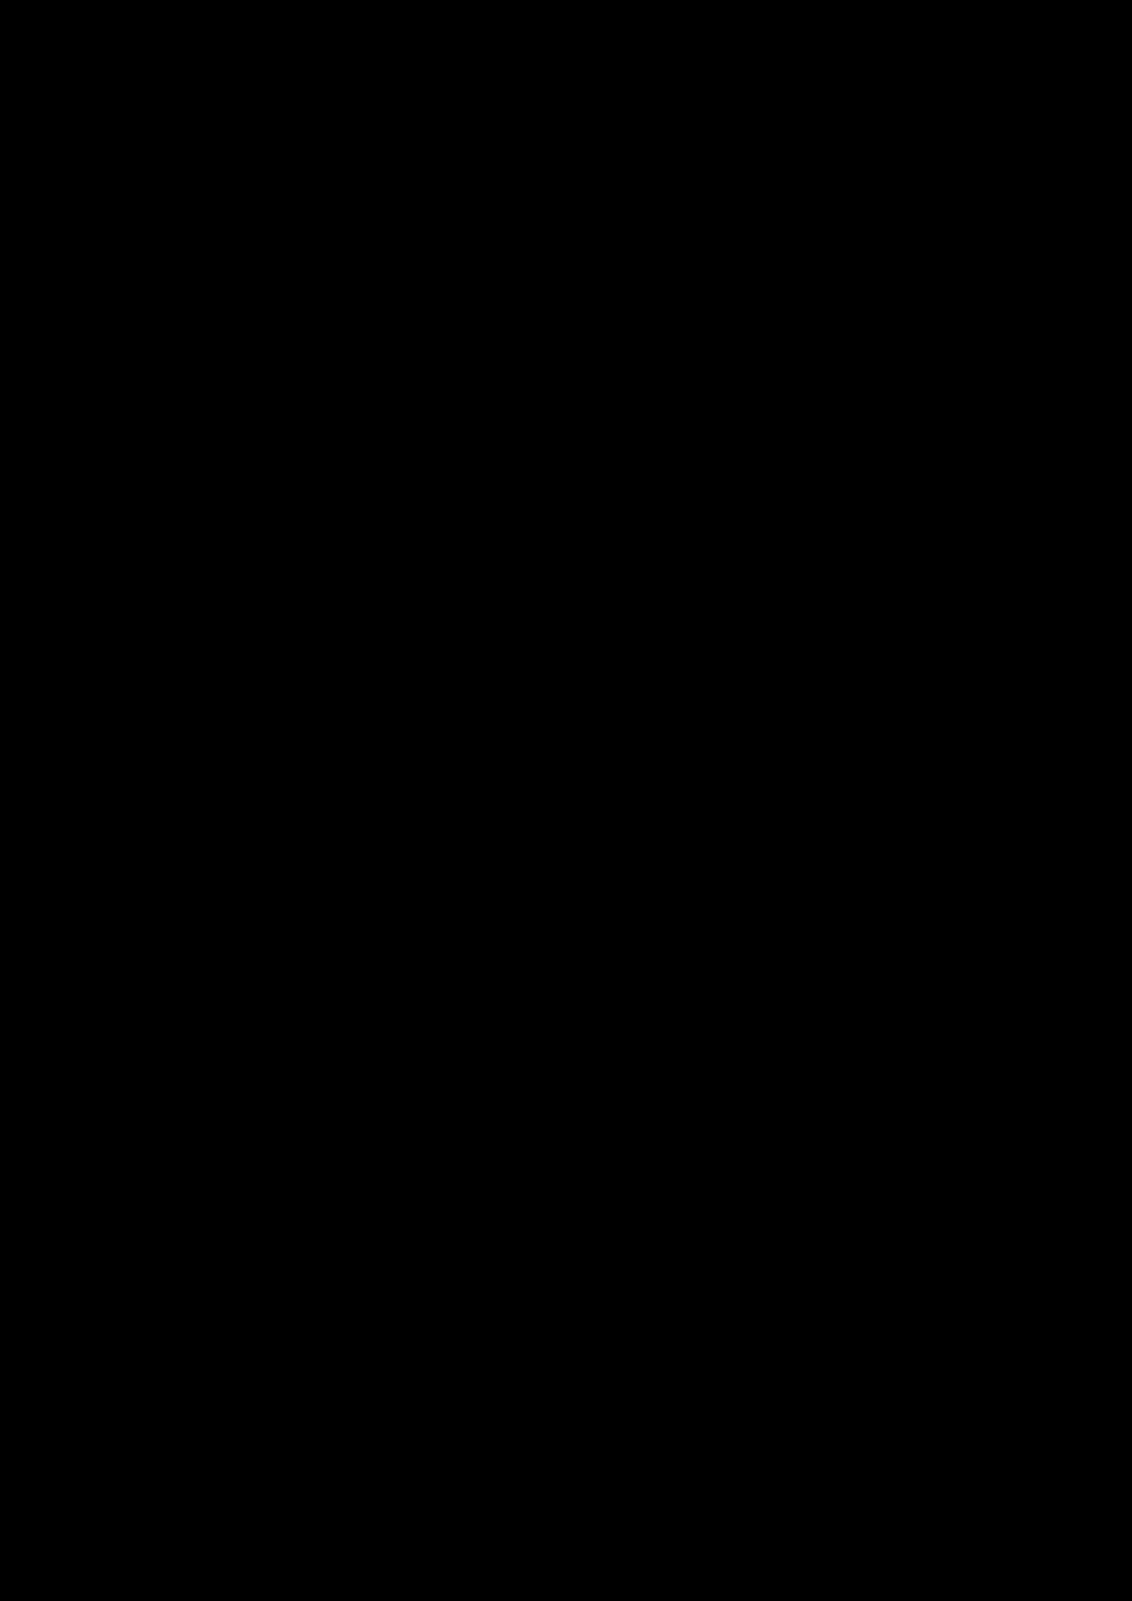 Malle Sijmen slide, Image 1